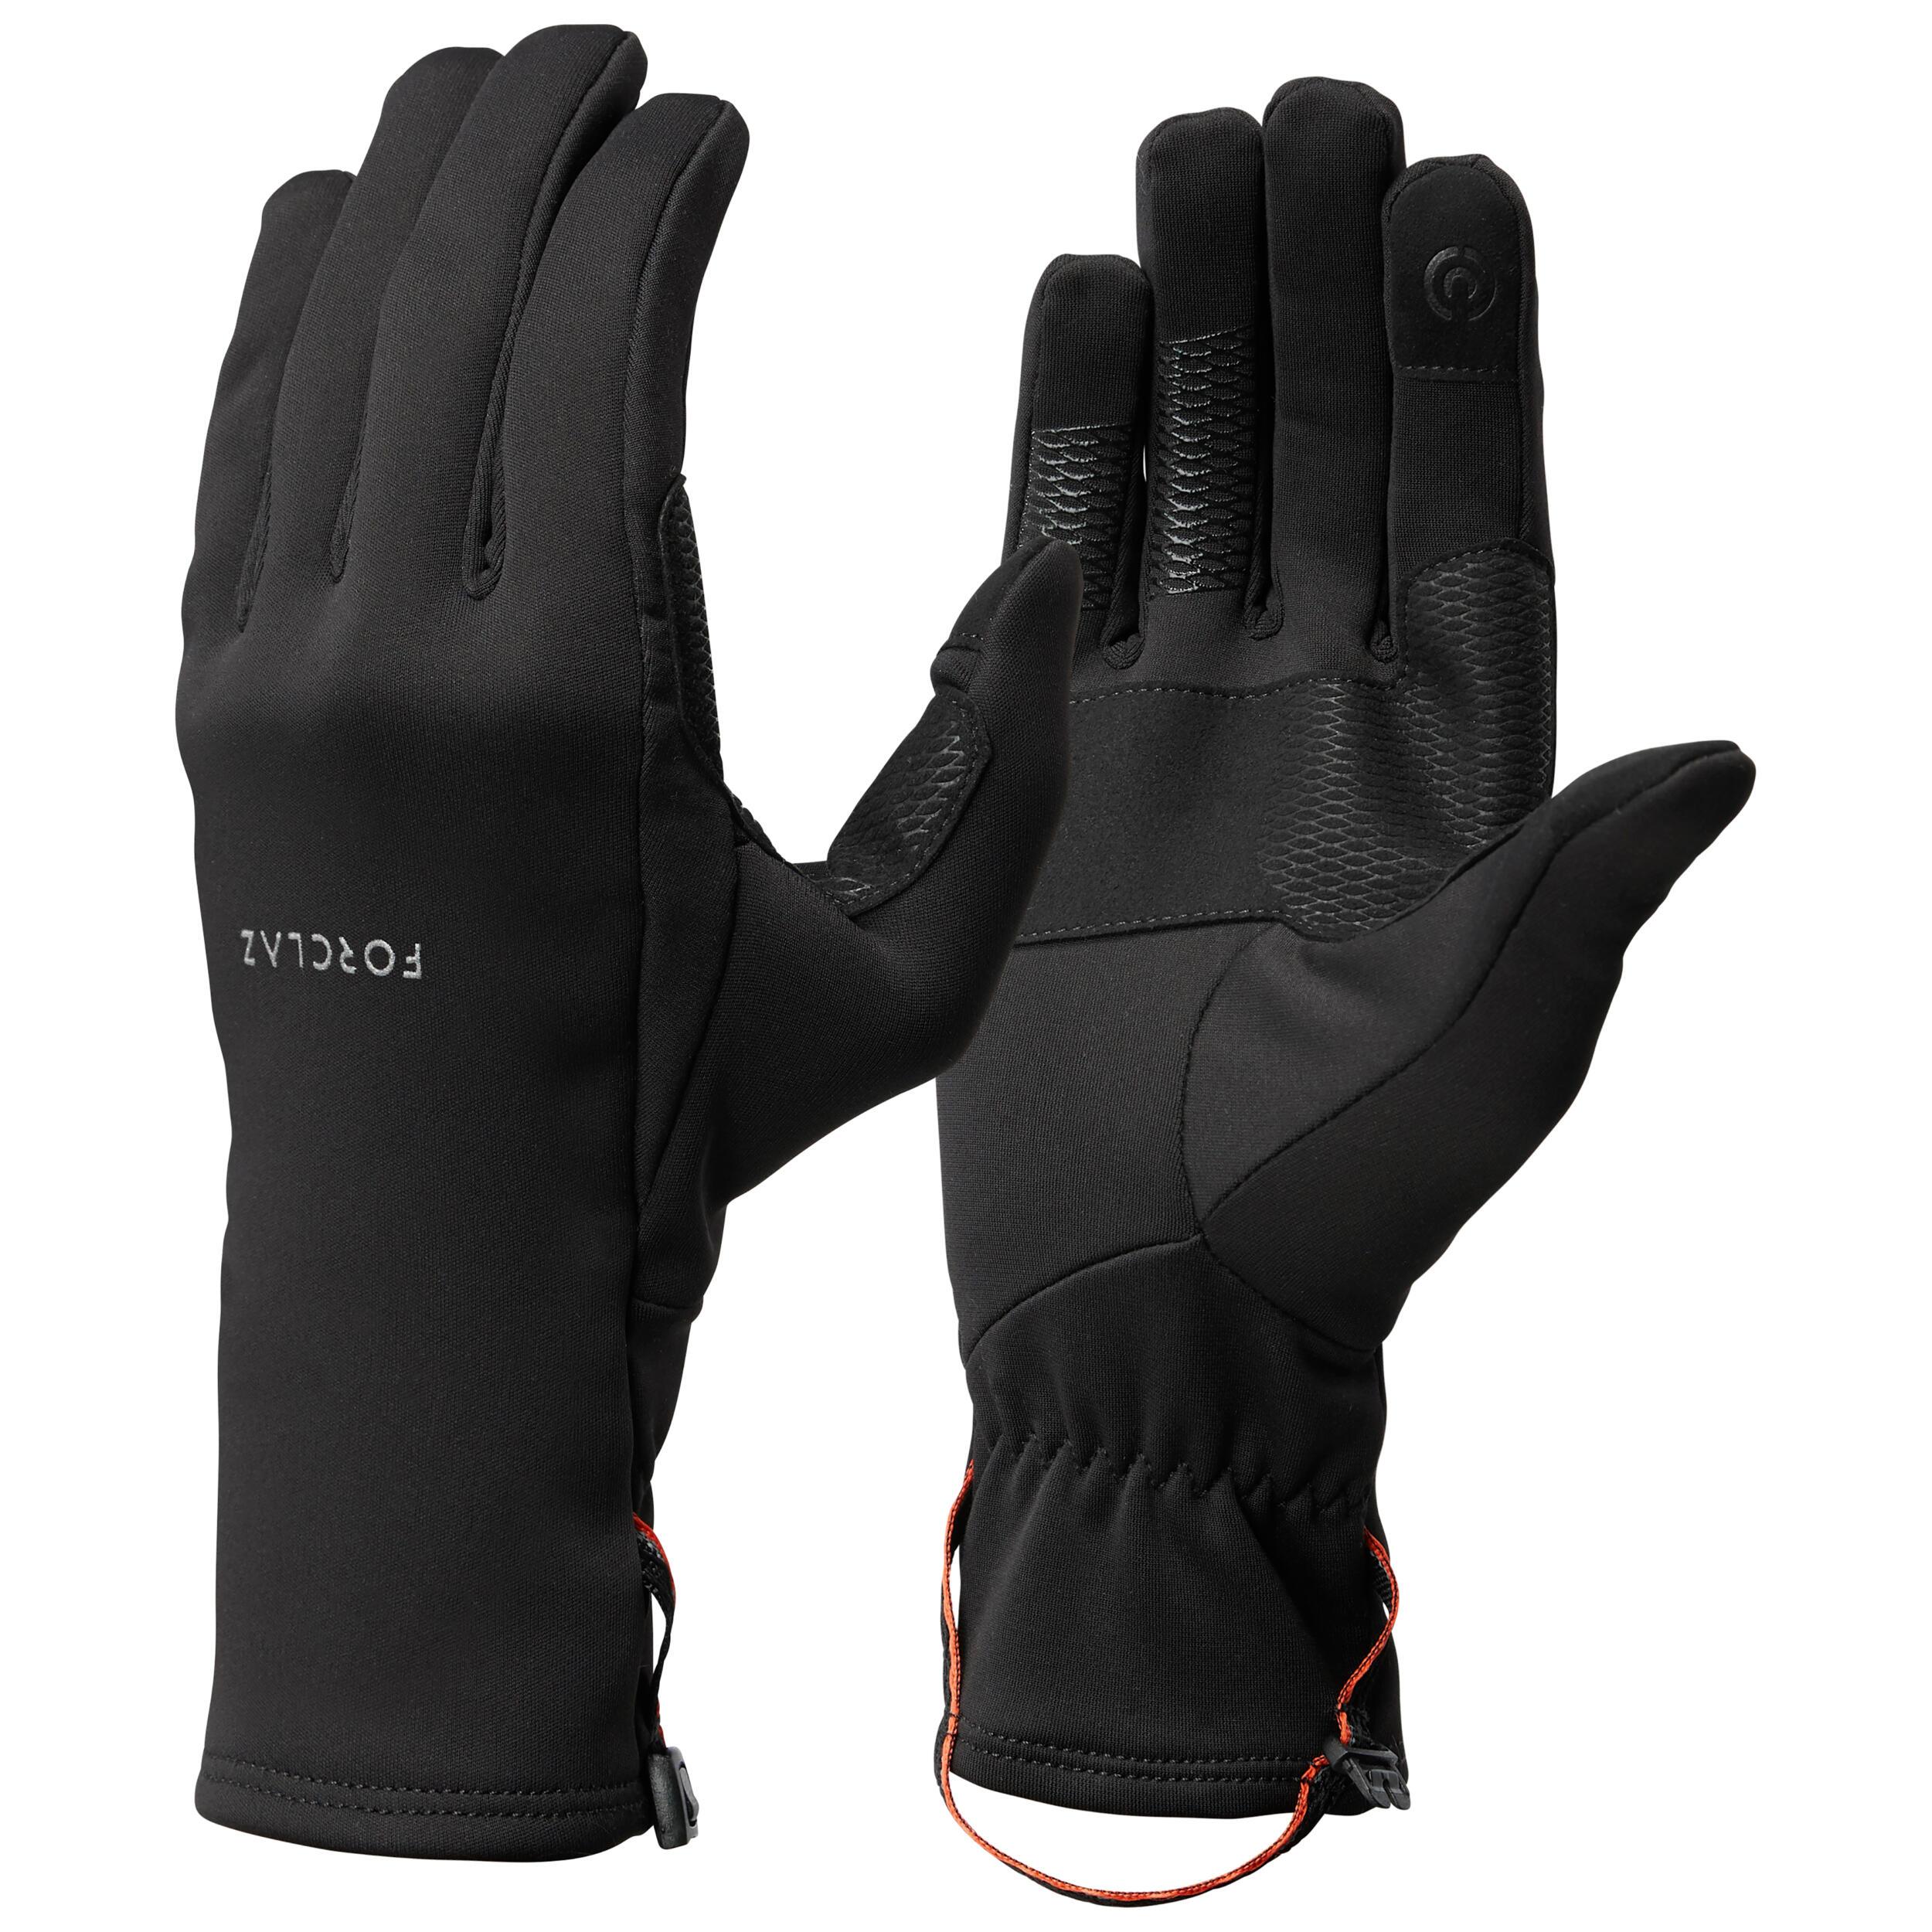 Mănuși respirante TREK 500